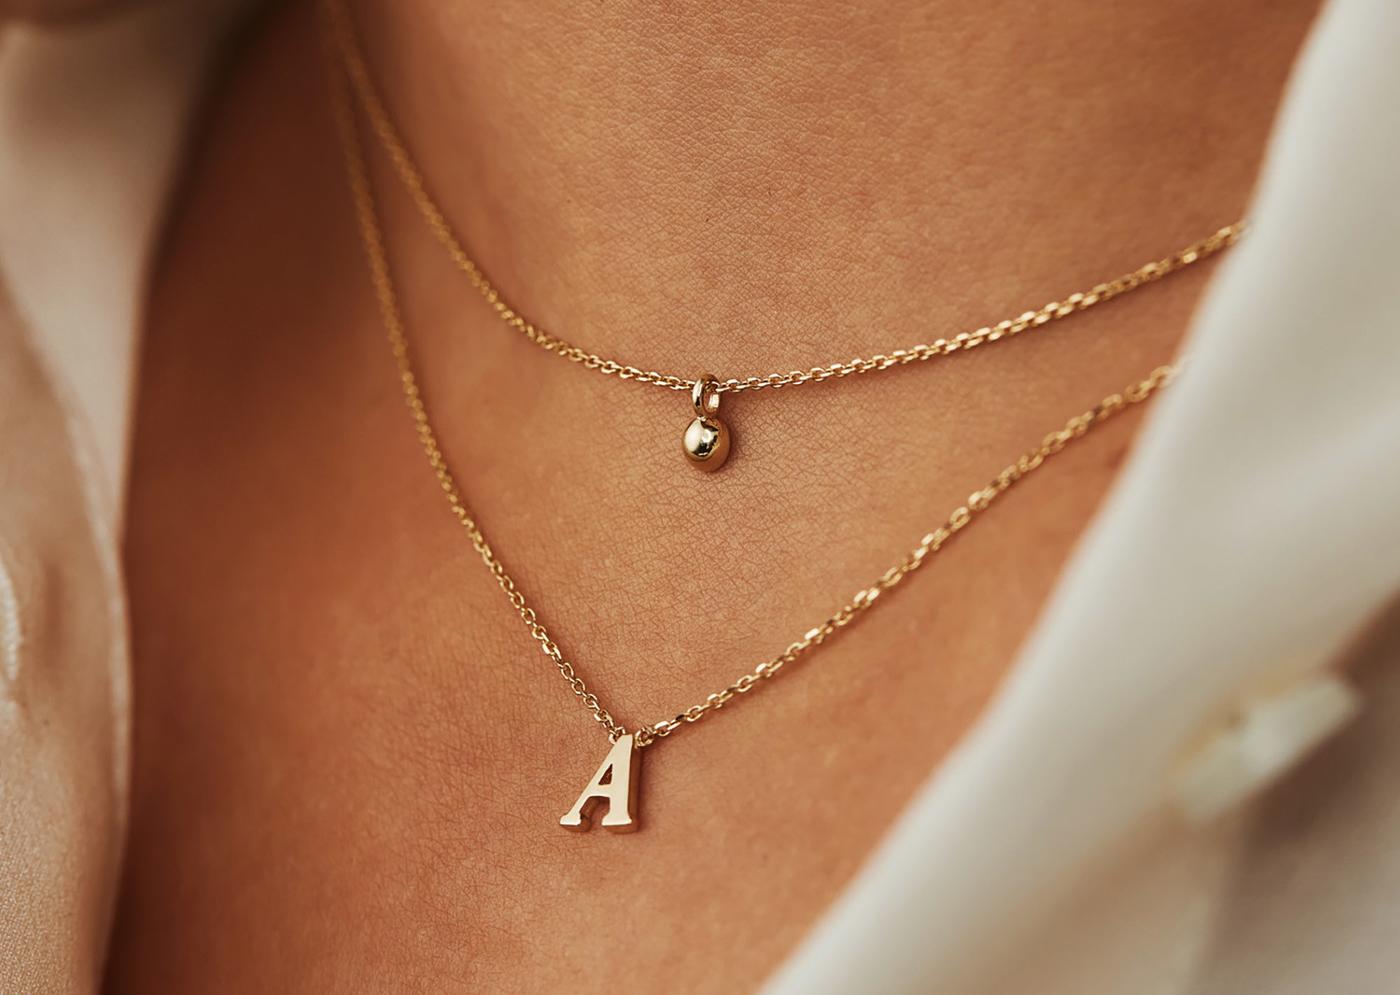 10 tips om je sieraden mooi te houden